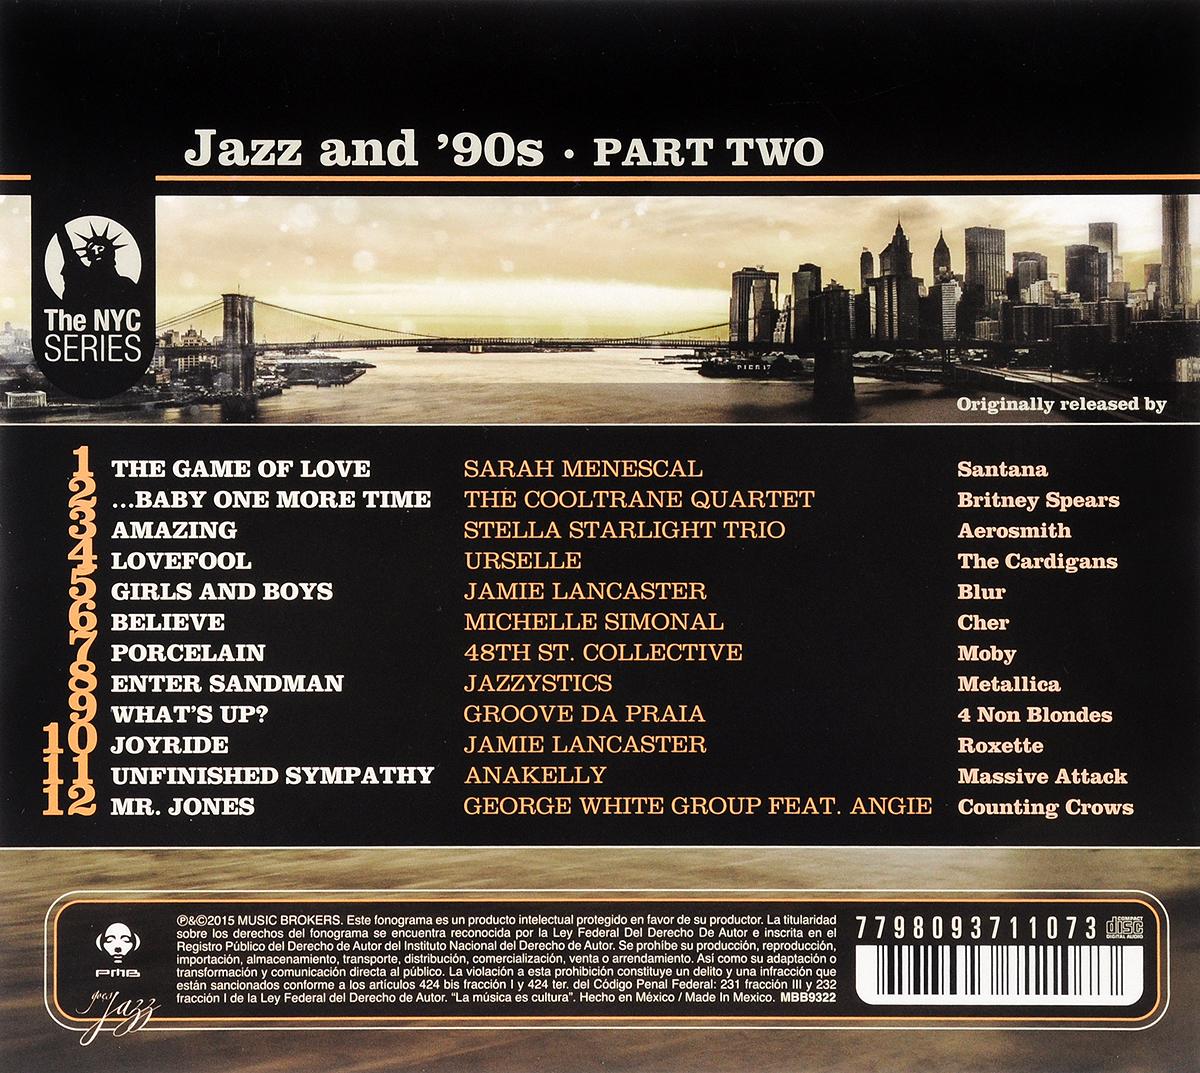 Jazz And '90s.  Part 2 Music Brokers,Волтэкс-инвест